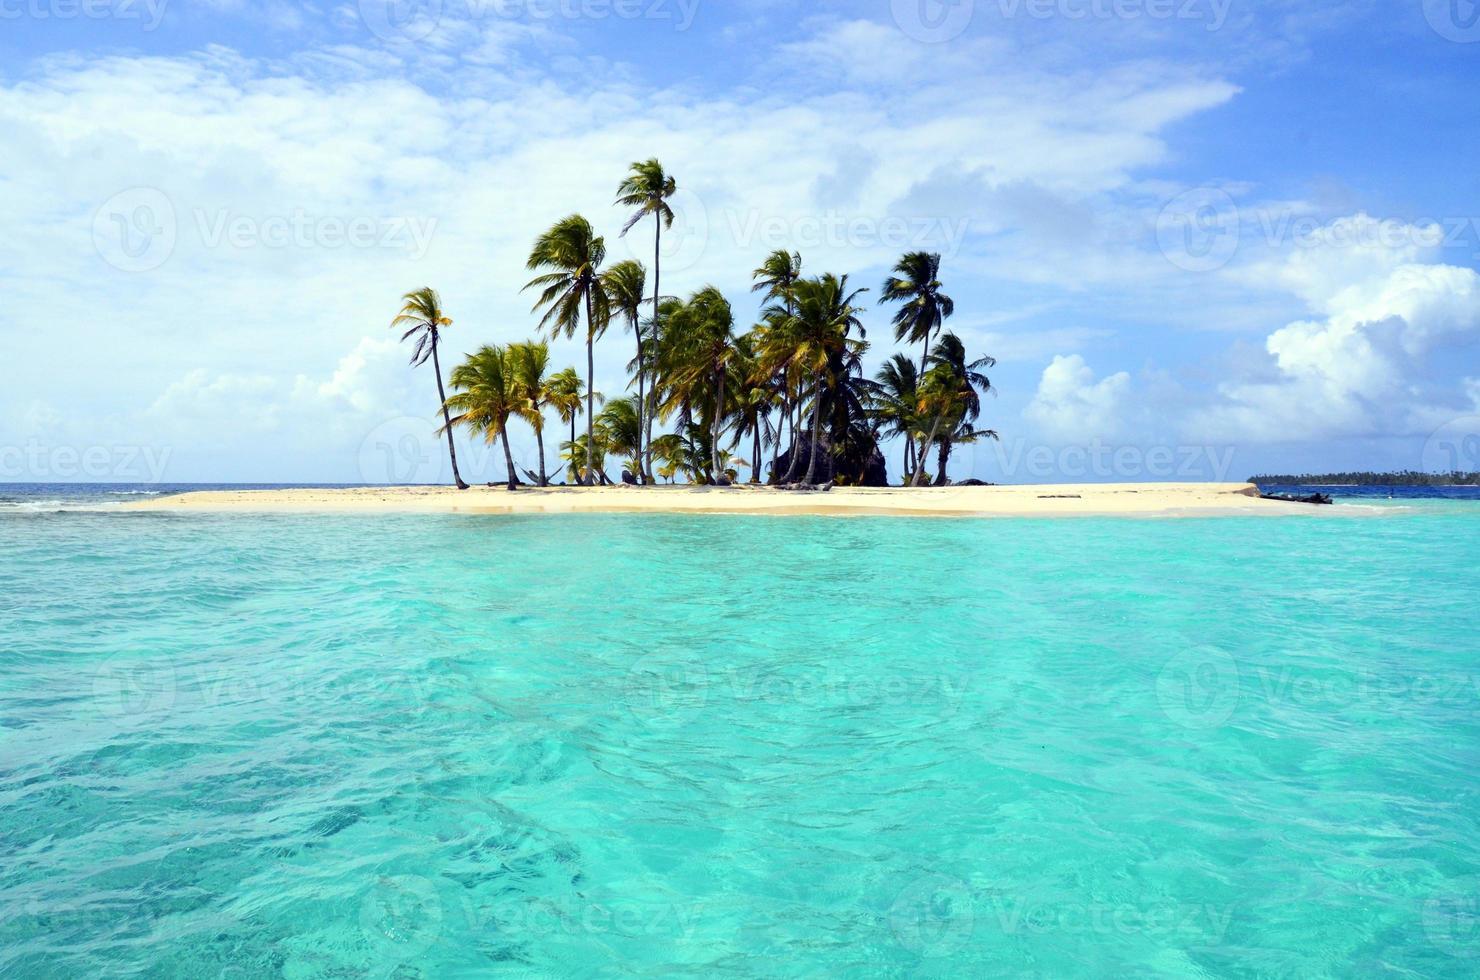 kuna yala - île de san blas photo